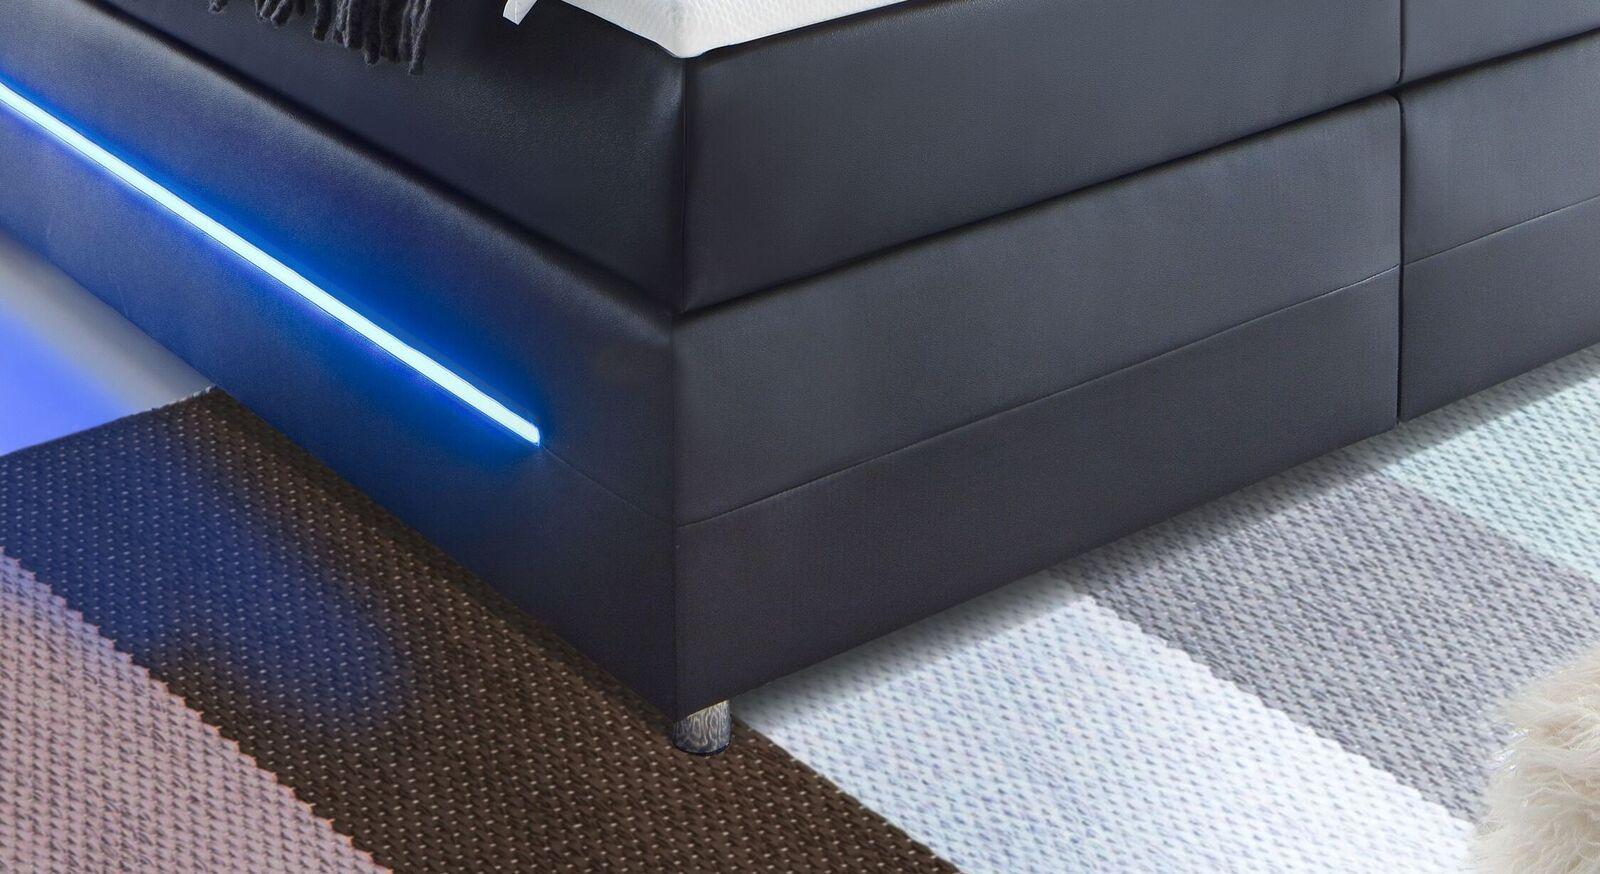 Boxspringbett Shelford mit seitlicher Box-Beleuchtung